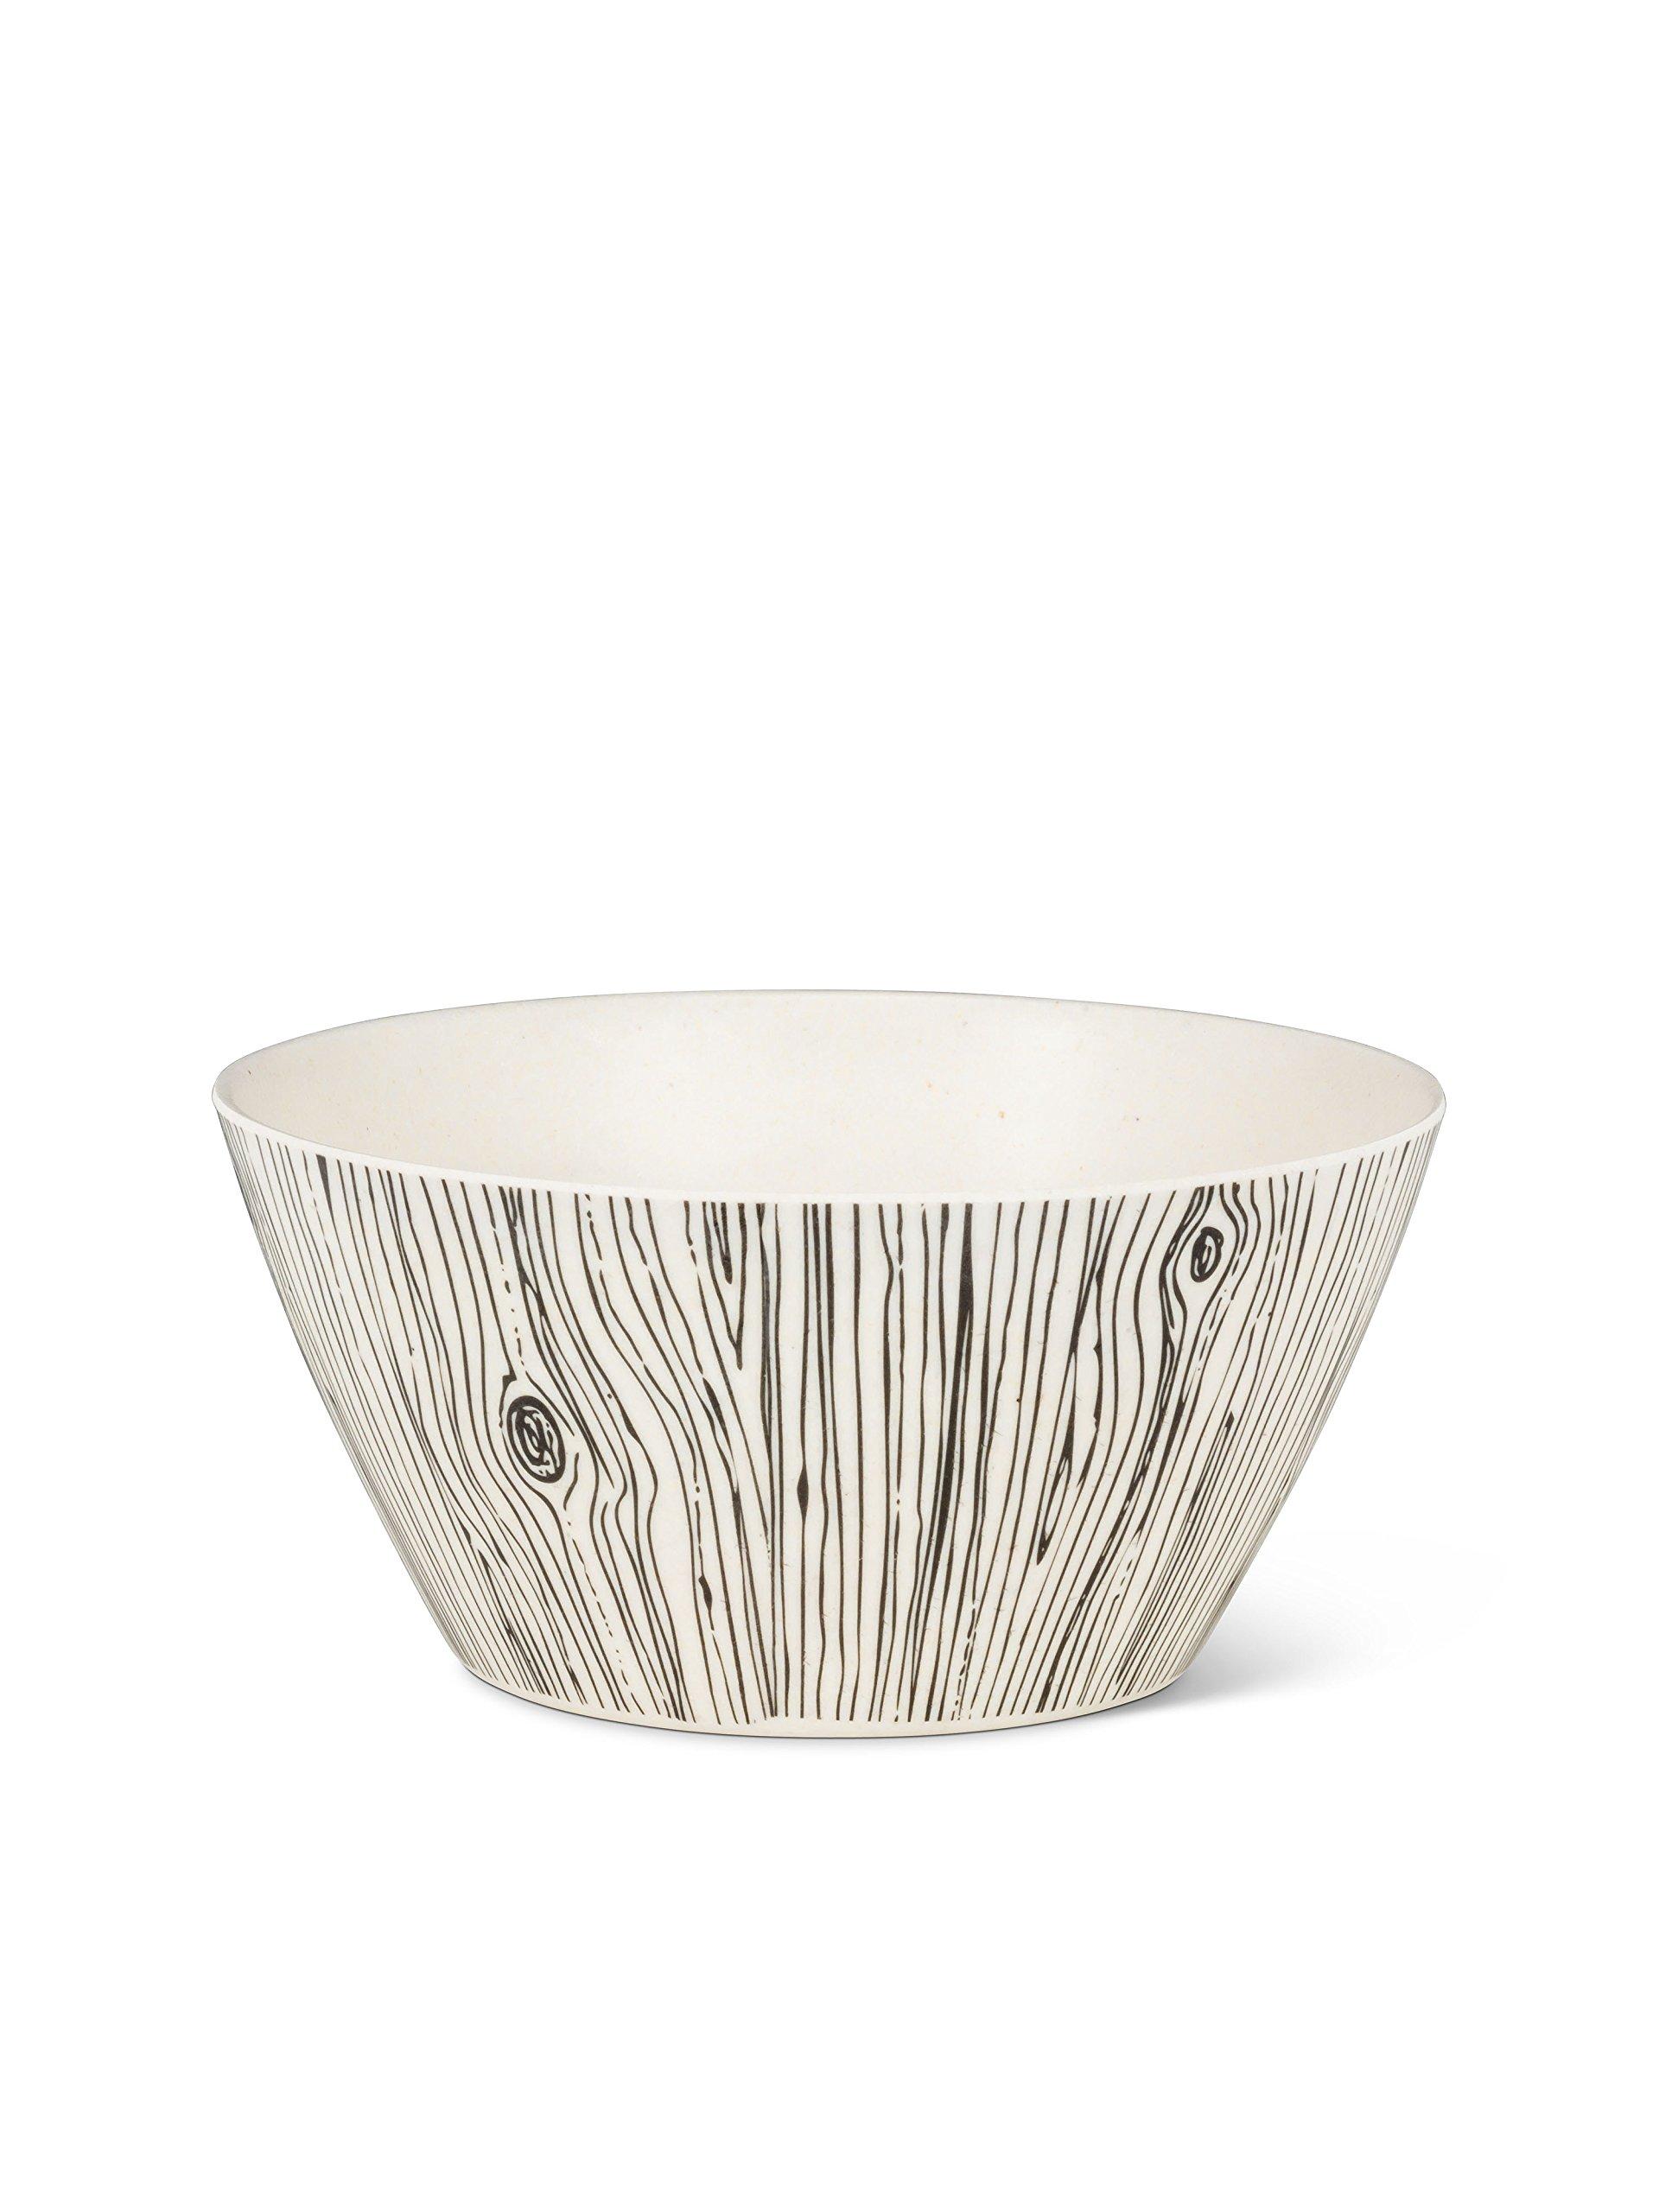 Abbott Collection 1227-NATURE/1407 Small Wood Grain Bowls, 5'', Black/White